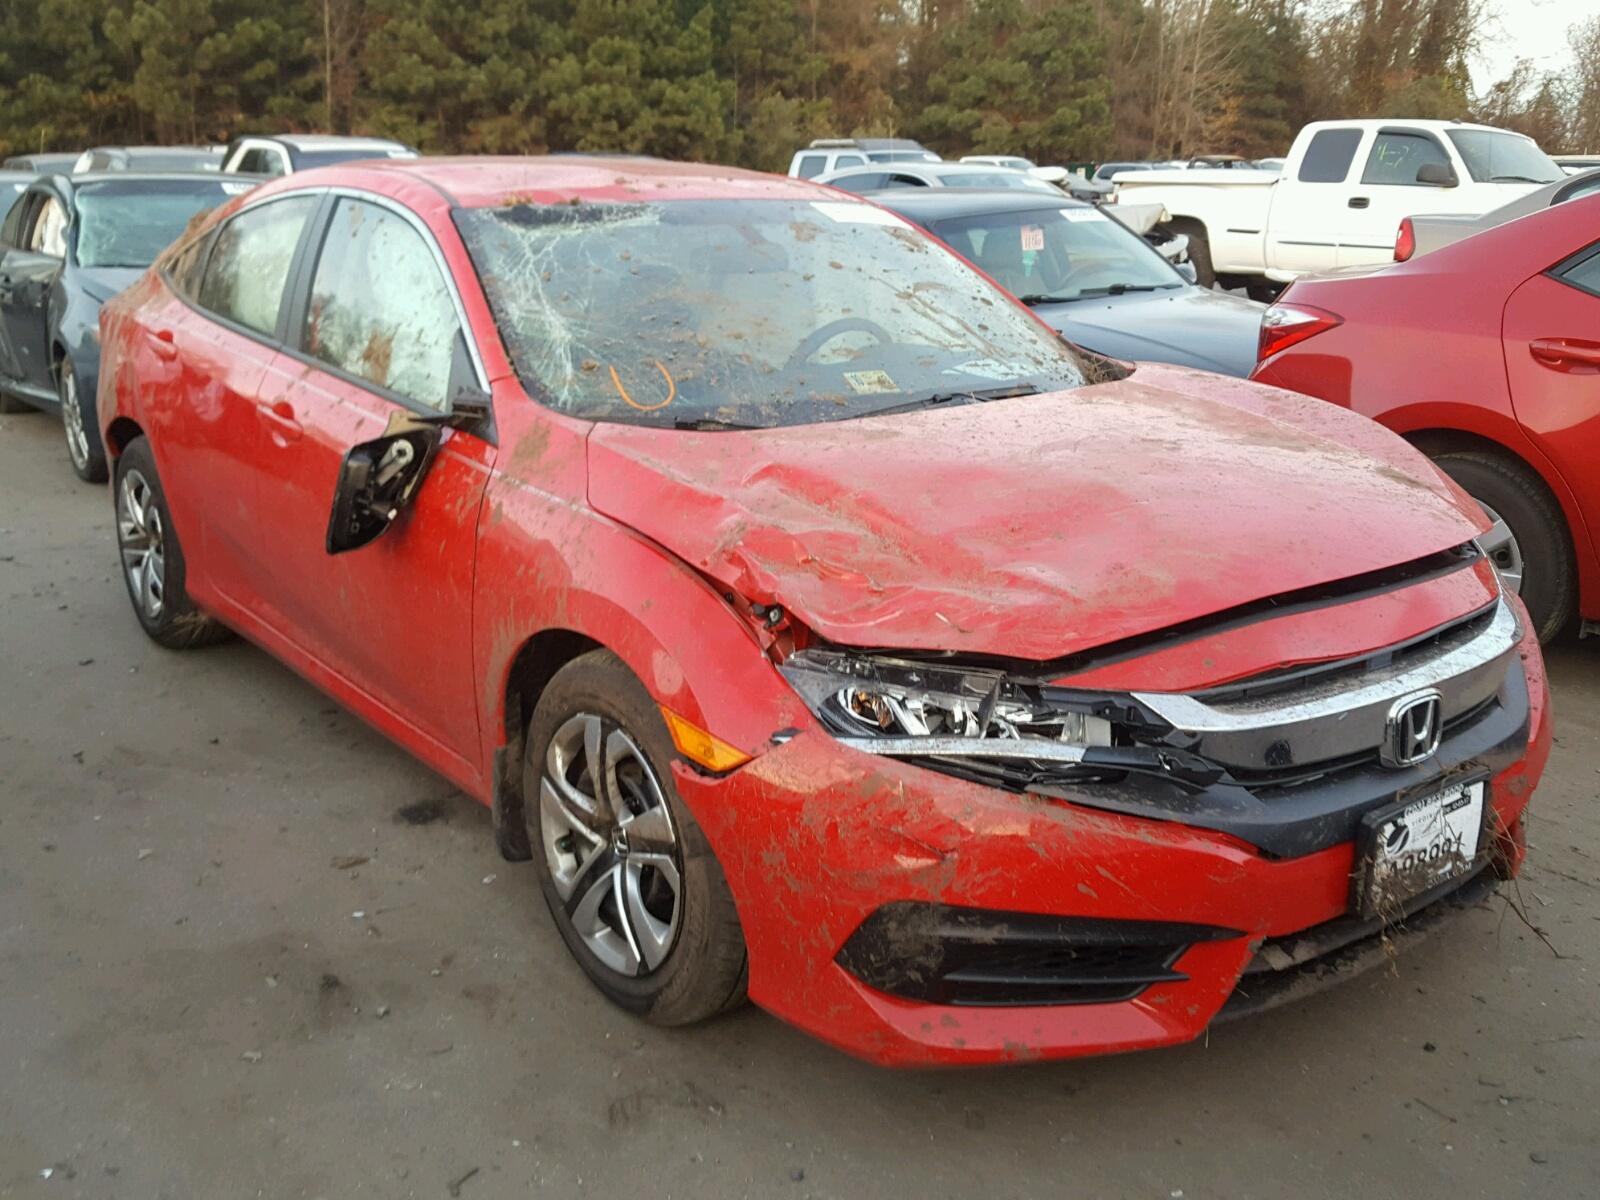 Salvage auto auction jackson ms 9